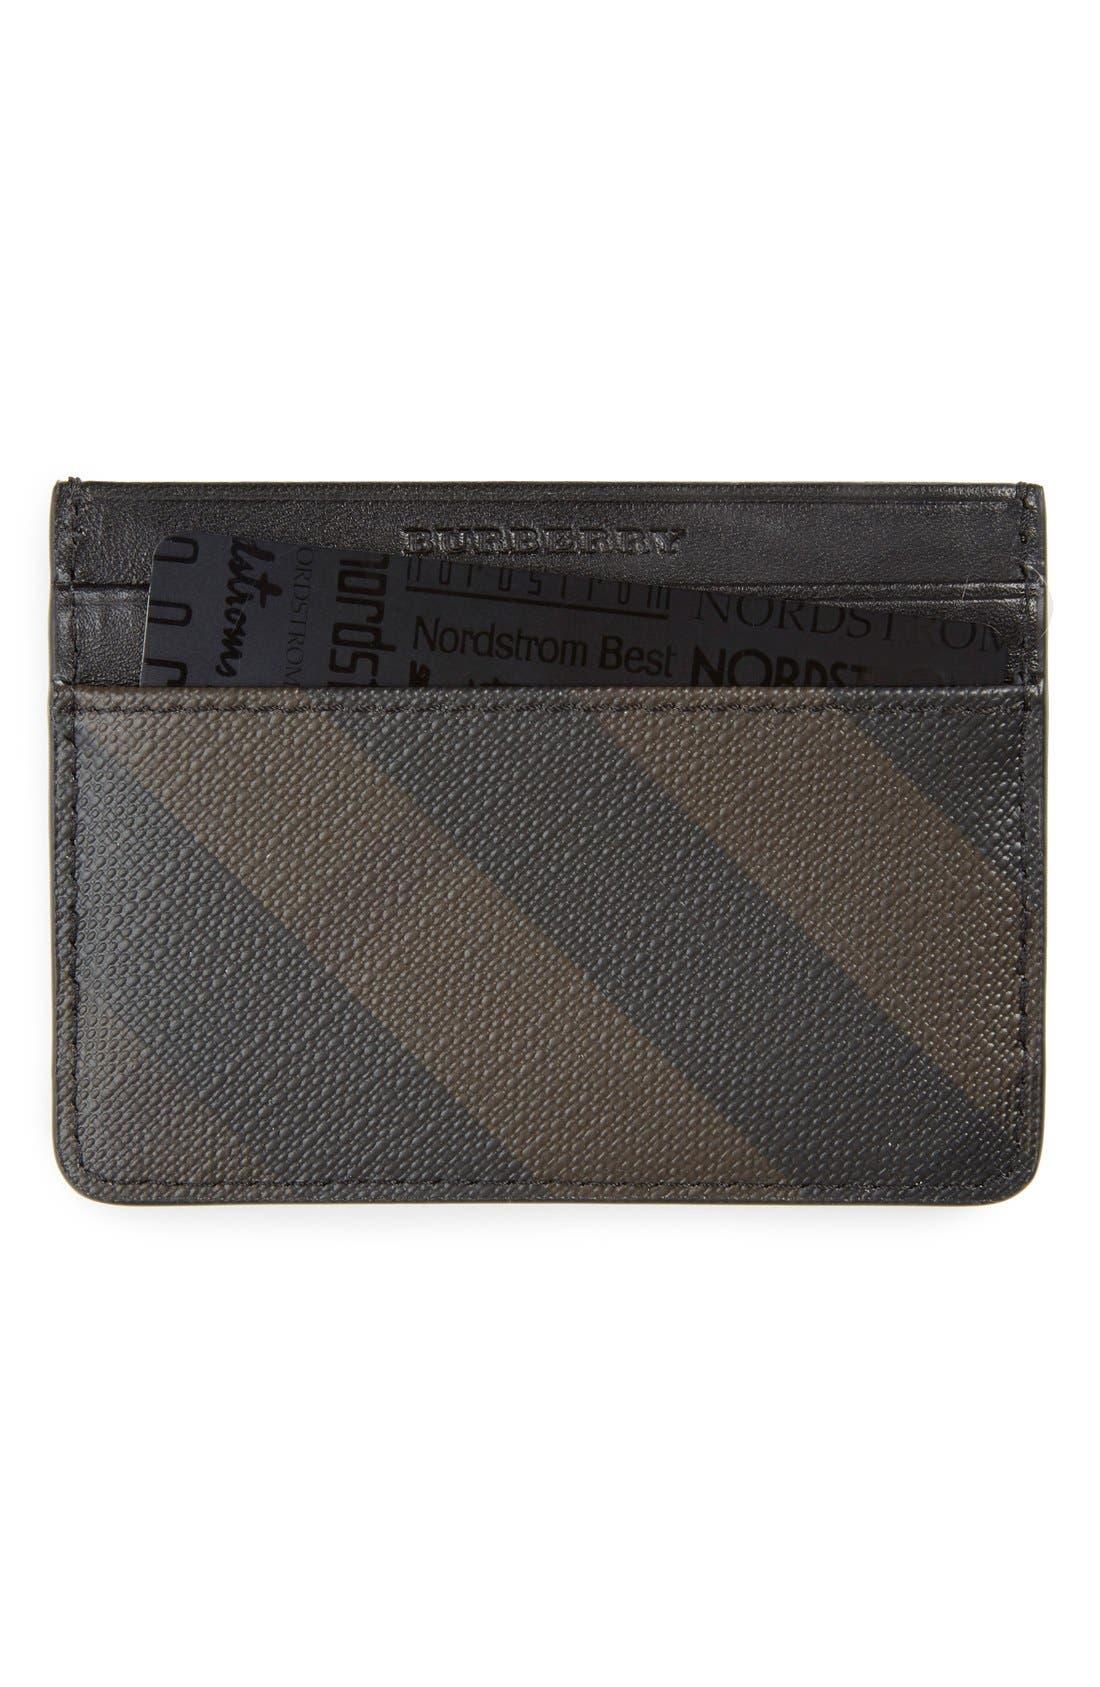 'New London' Check Card Case,                             Main thumbnail 1, color,                             207